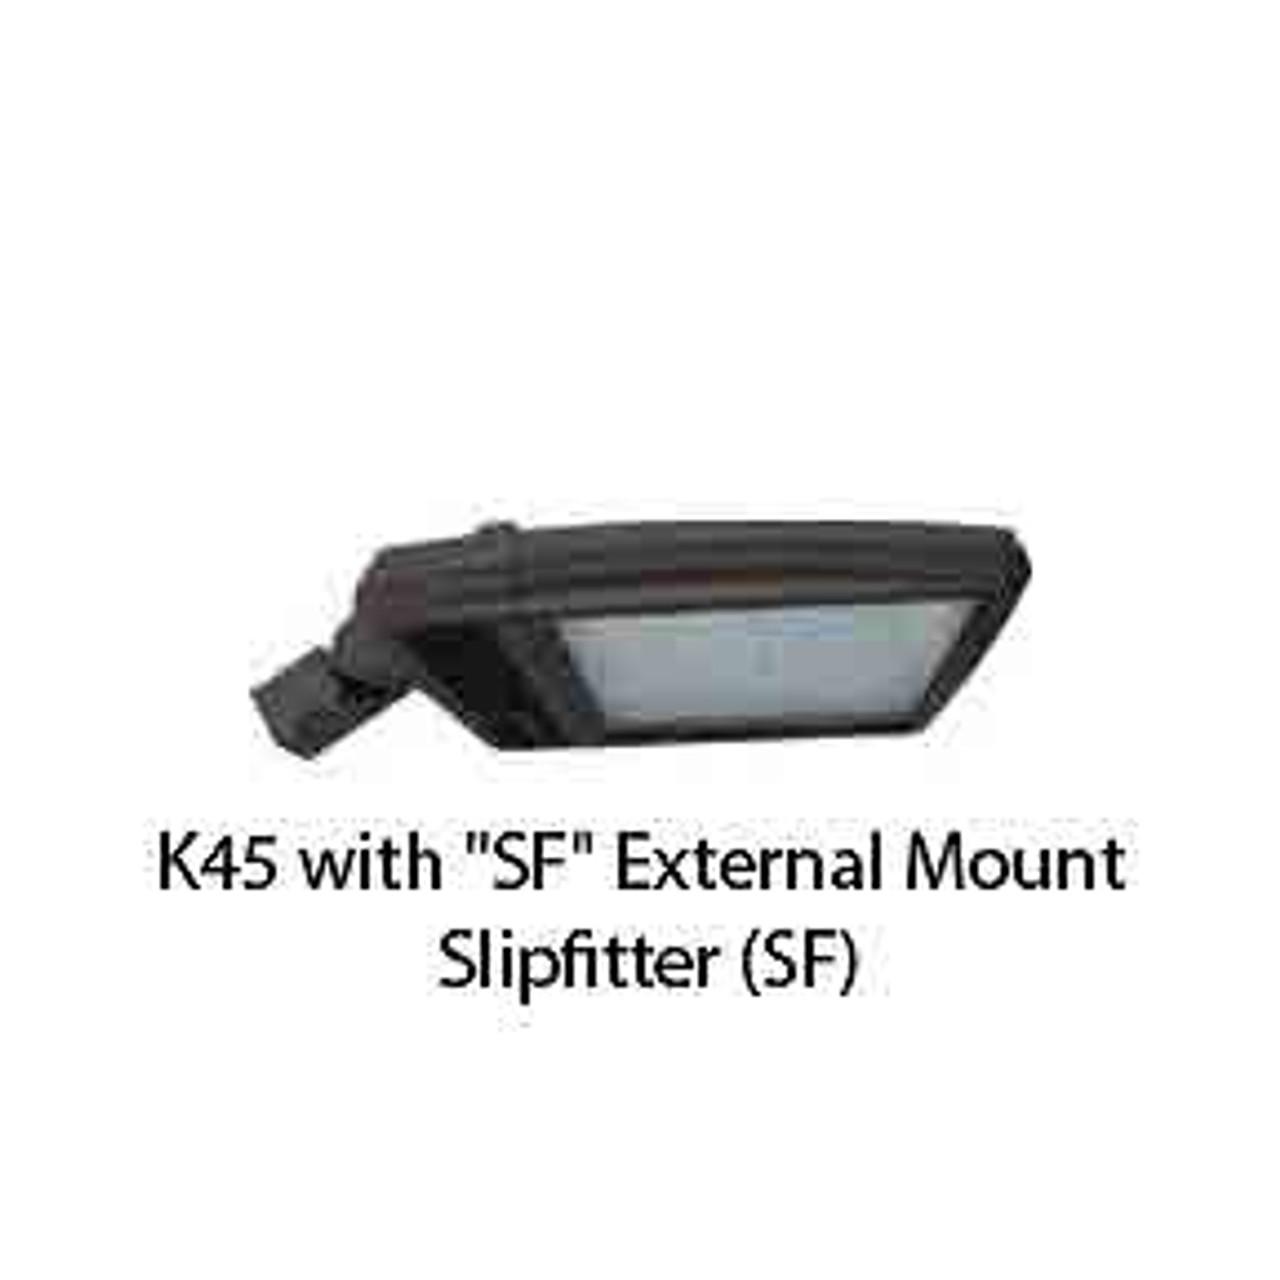 K45 with SF External Mount Slipfitter (SF)